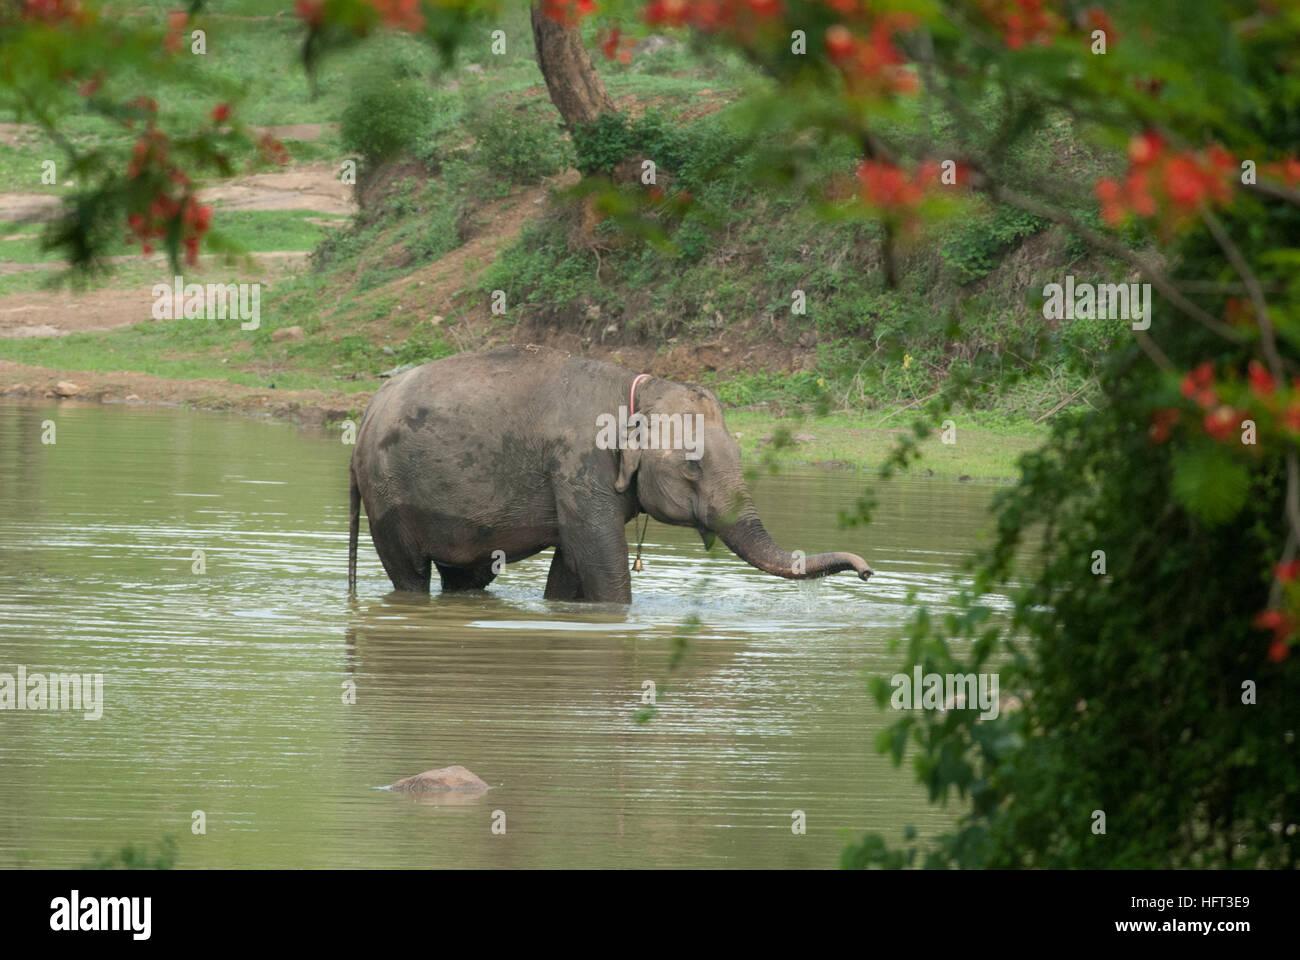 Captive elephant calf at Jungle Loges BR Hills enjoying itself in the lake - Stock Image